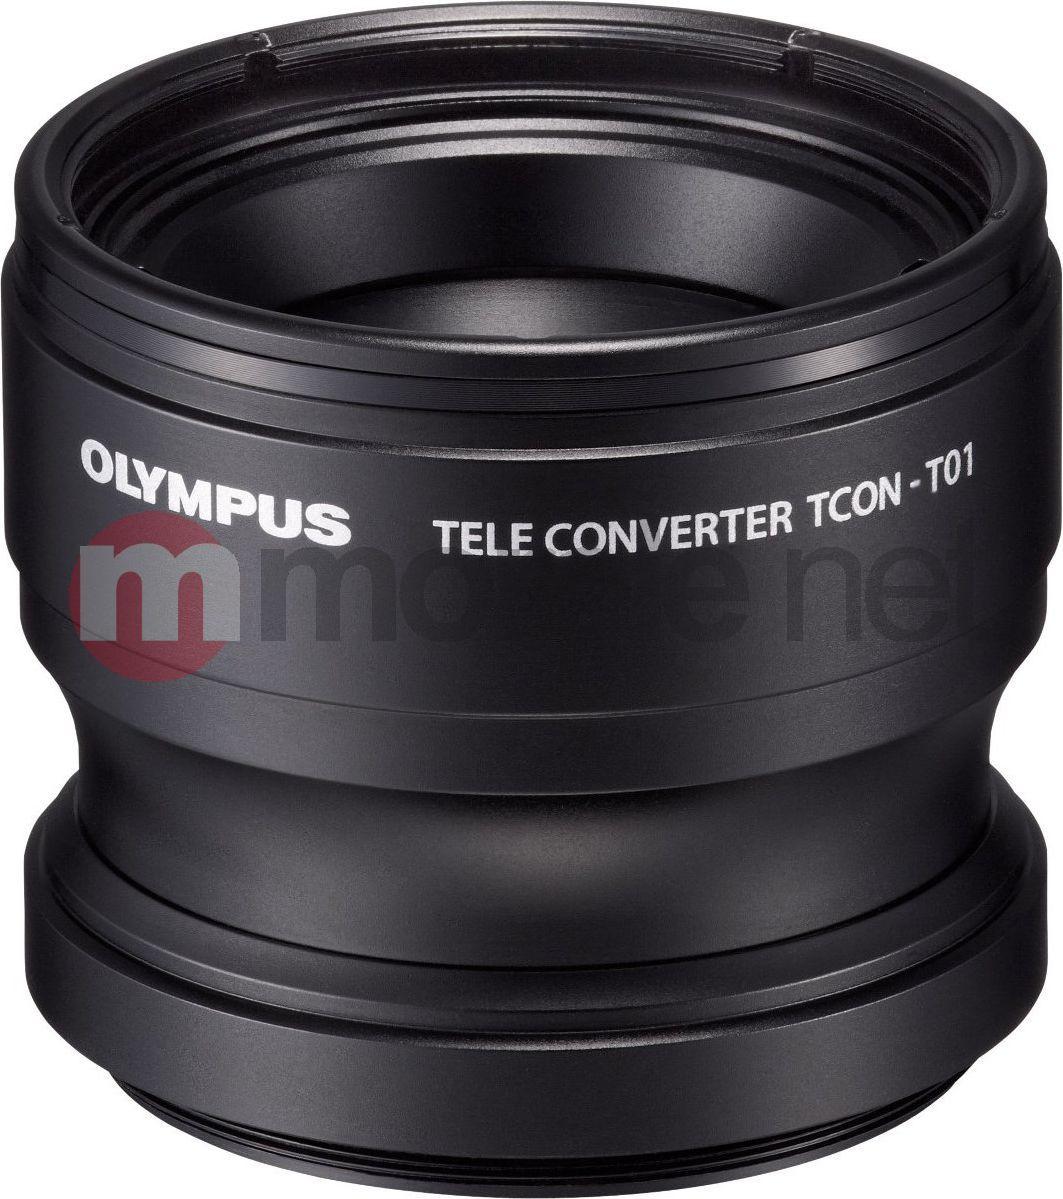 Konwerter Olympus TCON-T01 1